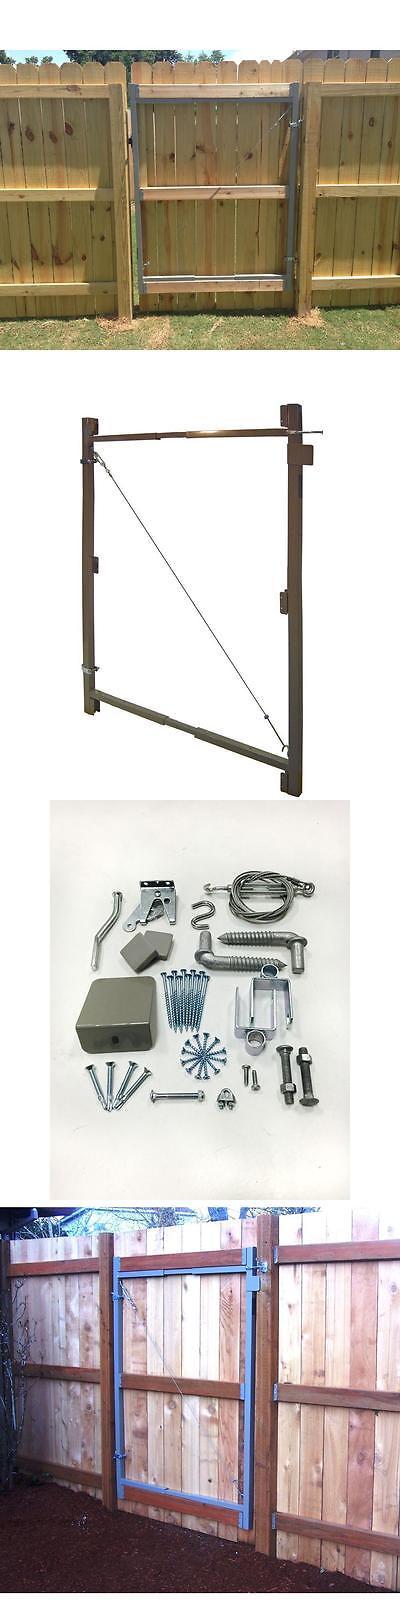 Garden Gates 139948: Steel Gate Frame Kit Garden Fence Adjustable ...